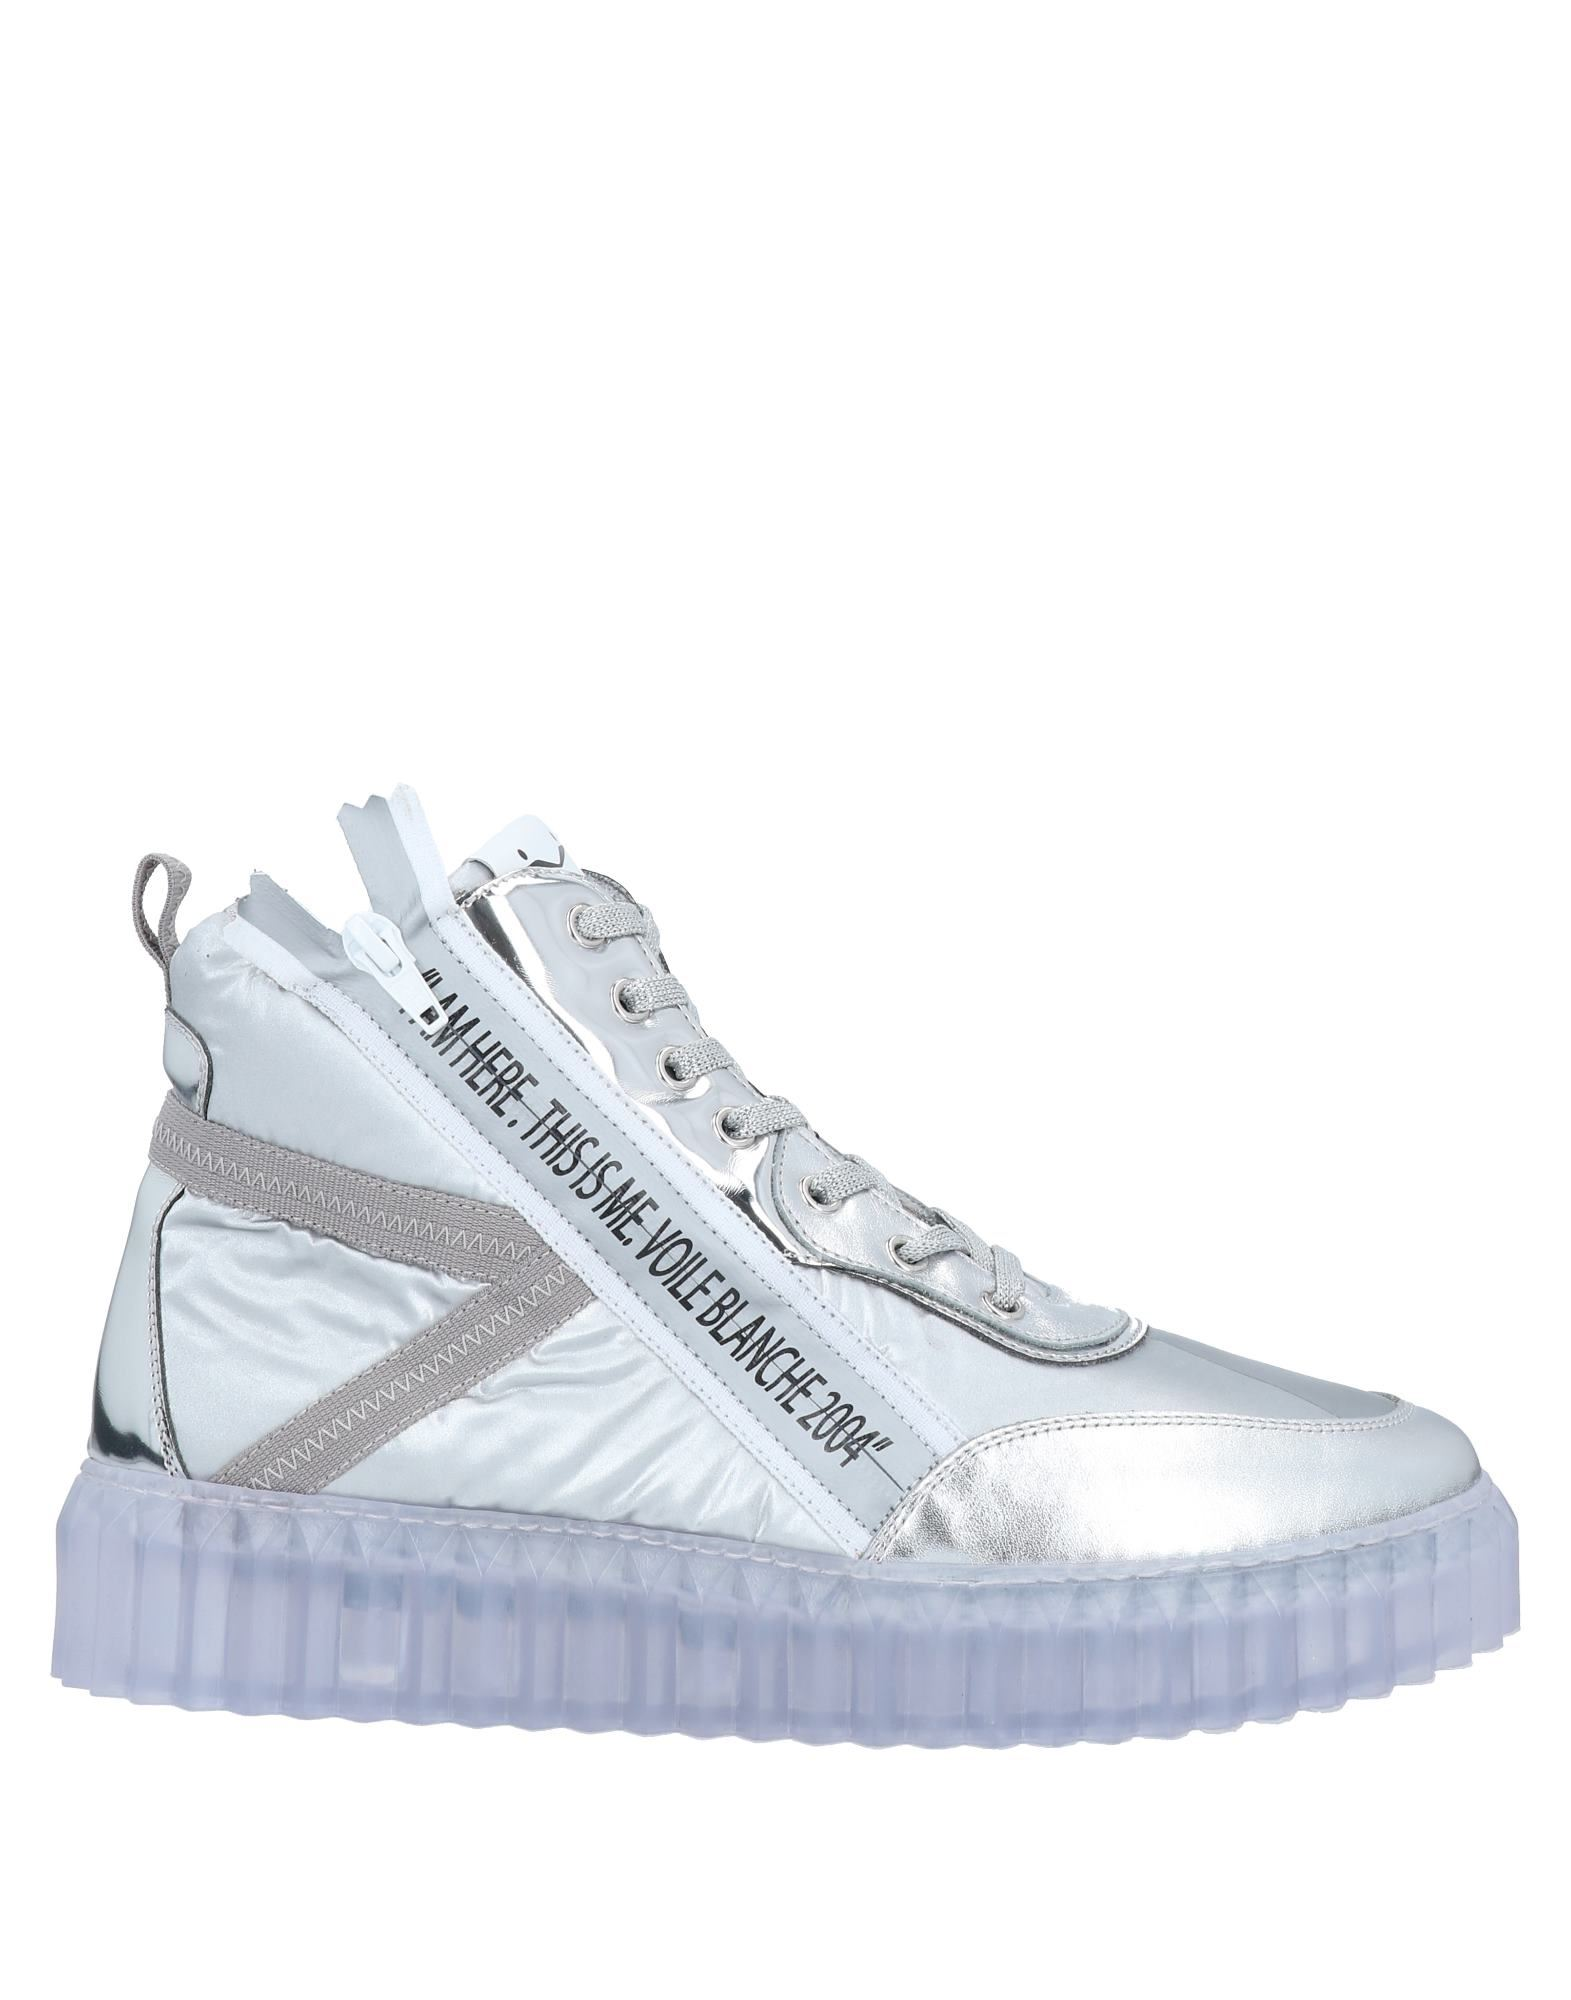 VOILE BLANCHE Высокие кеды и кроссовки voile blanche высокие кеды и кроссовки